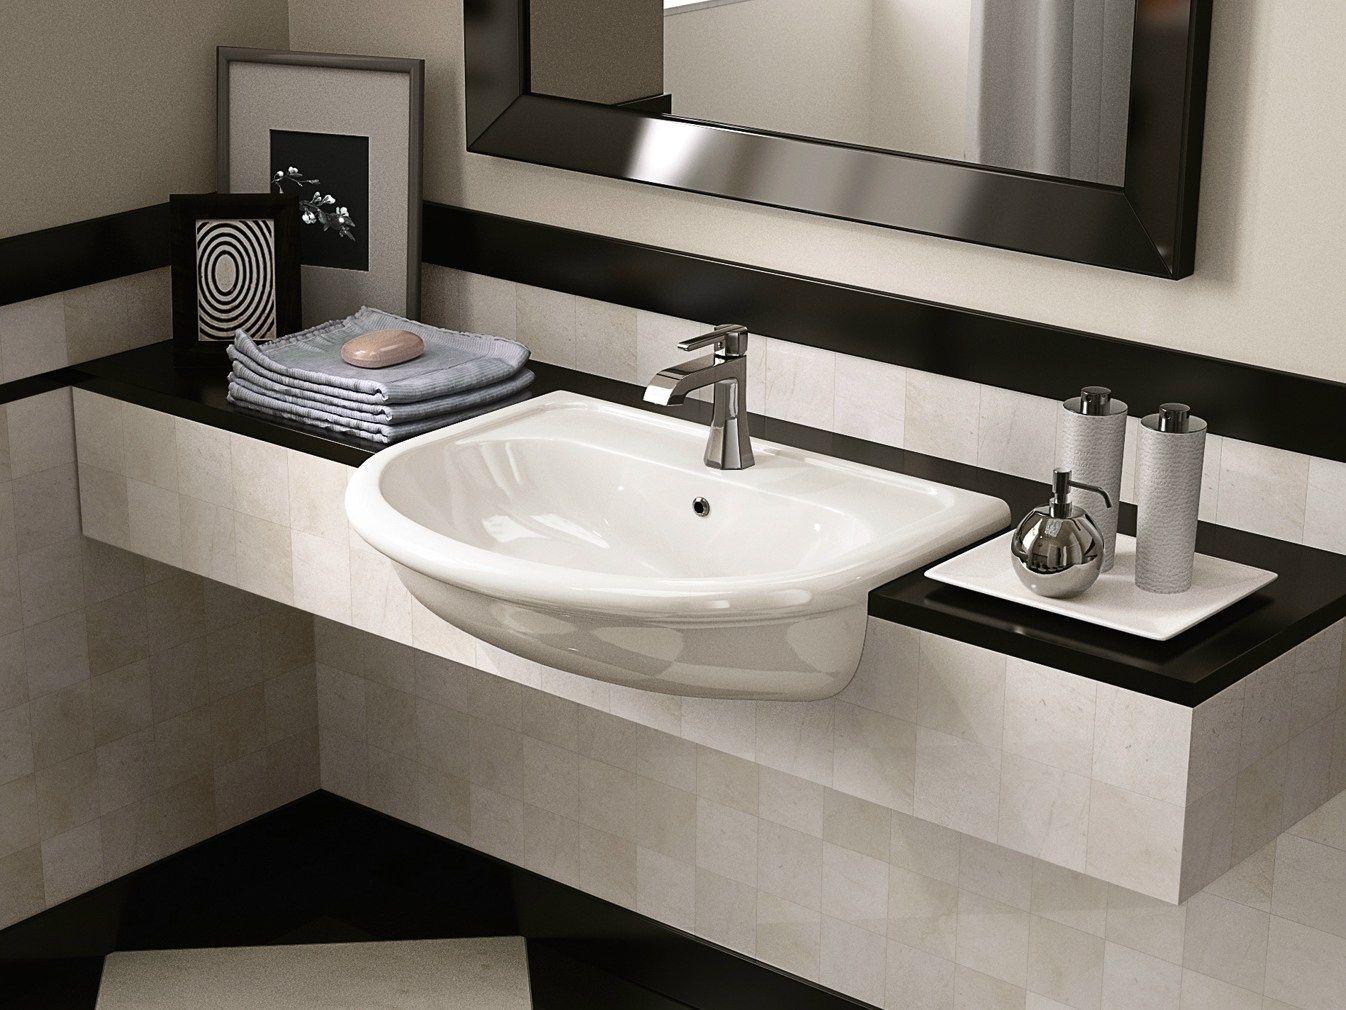 Fidia lavabo semiempotrado by ceramica flaminia for Lavabos de ceramica